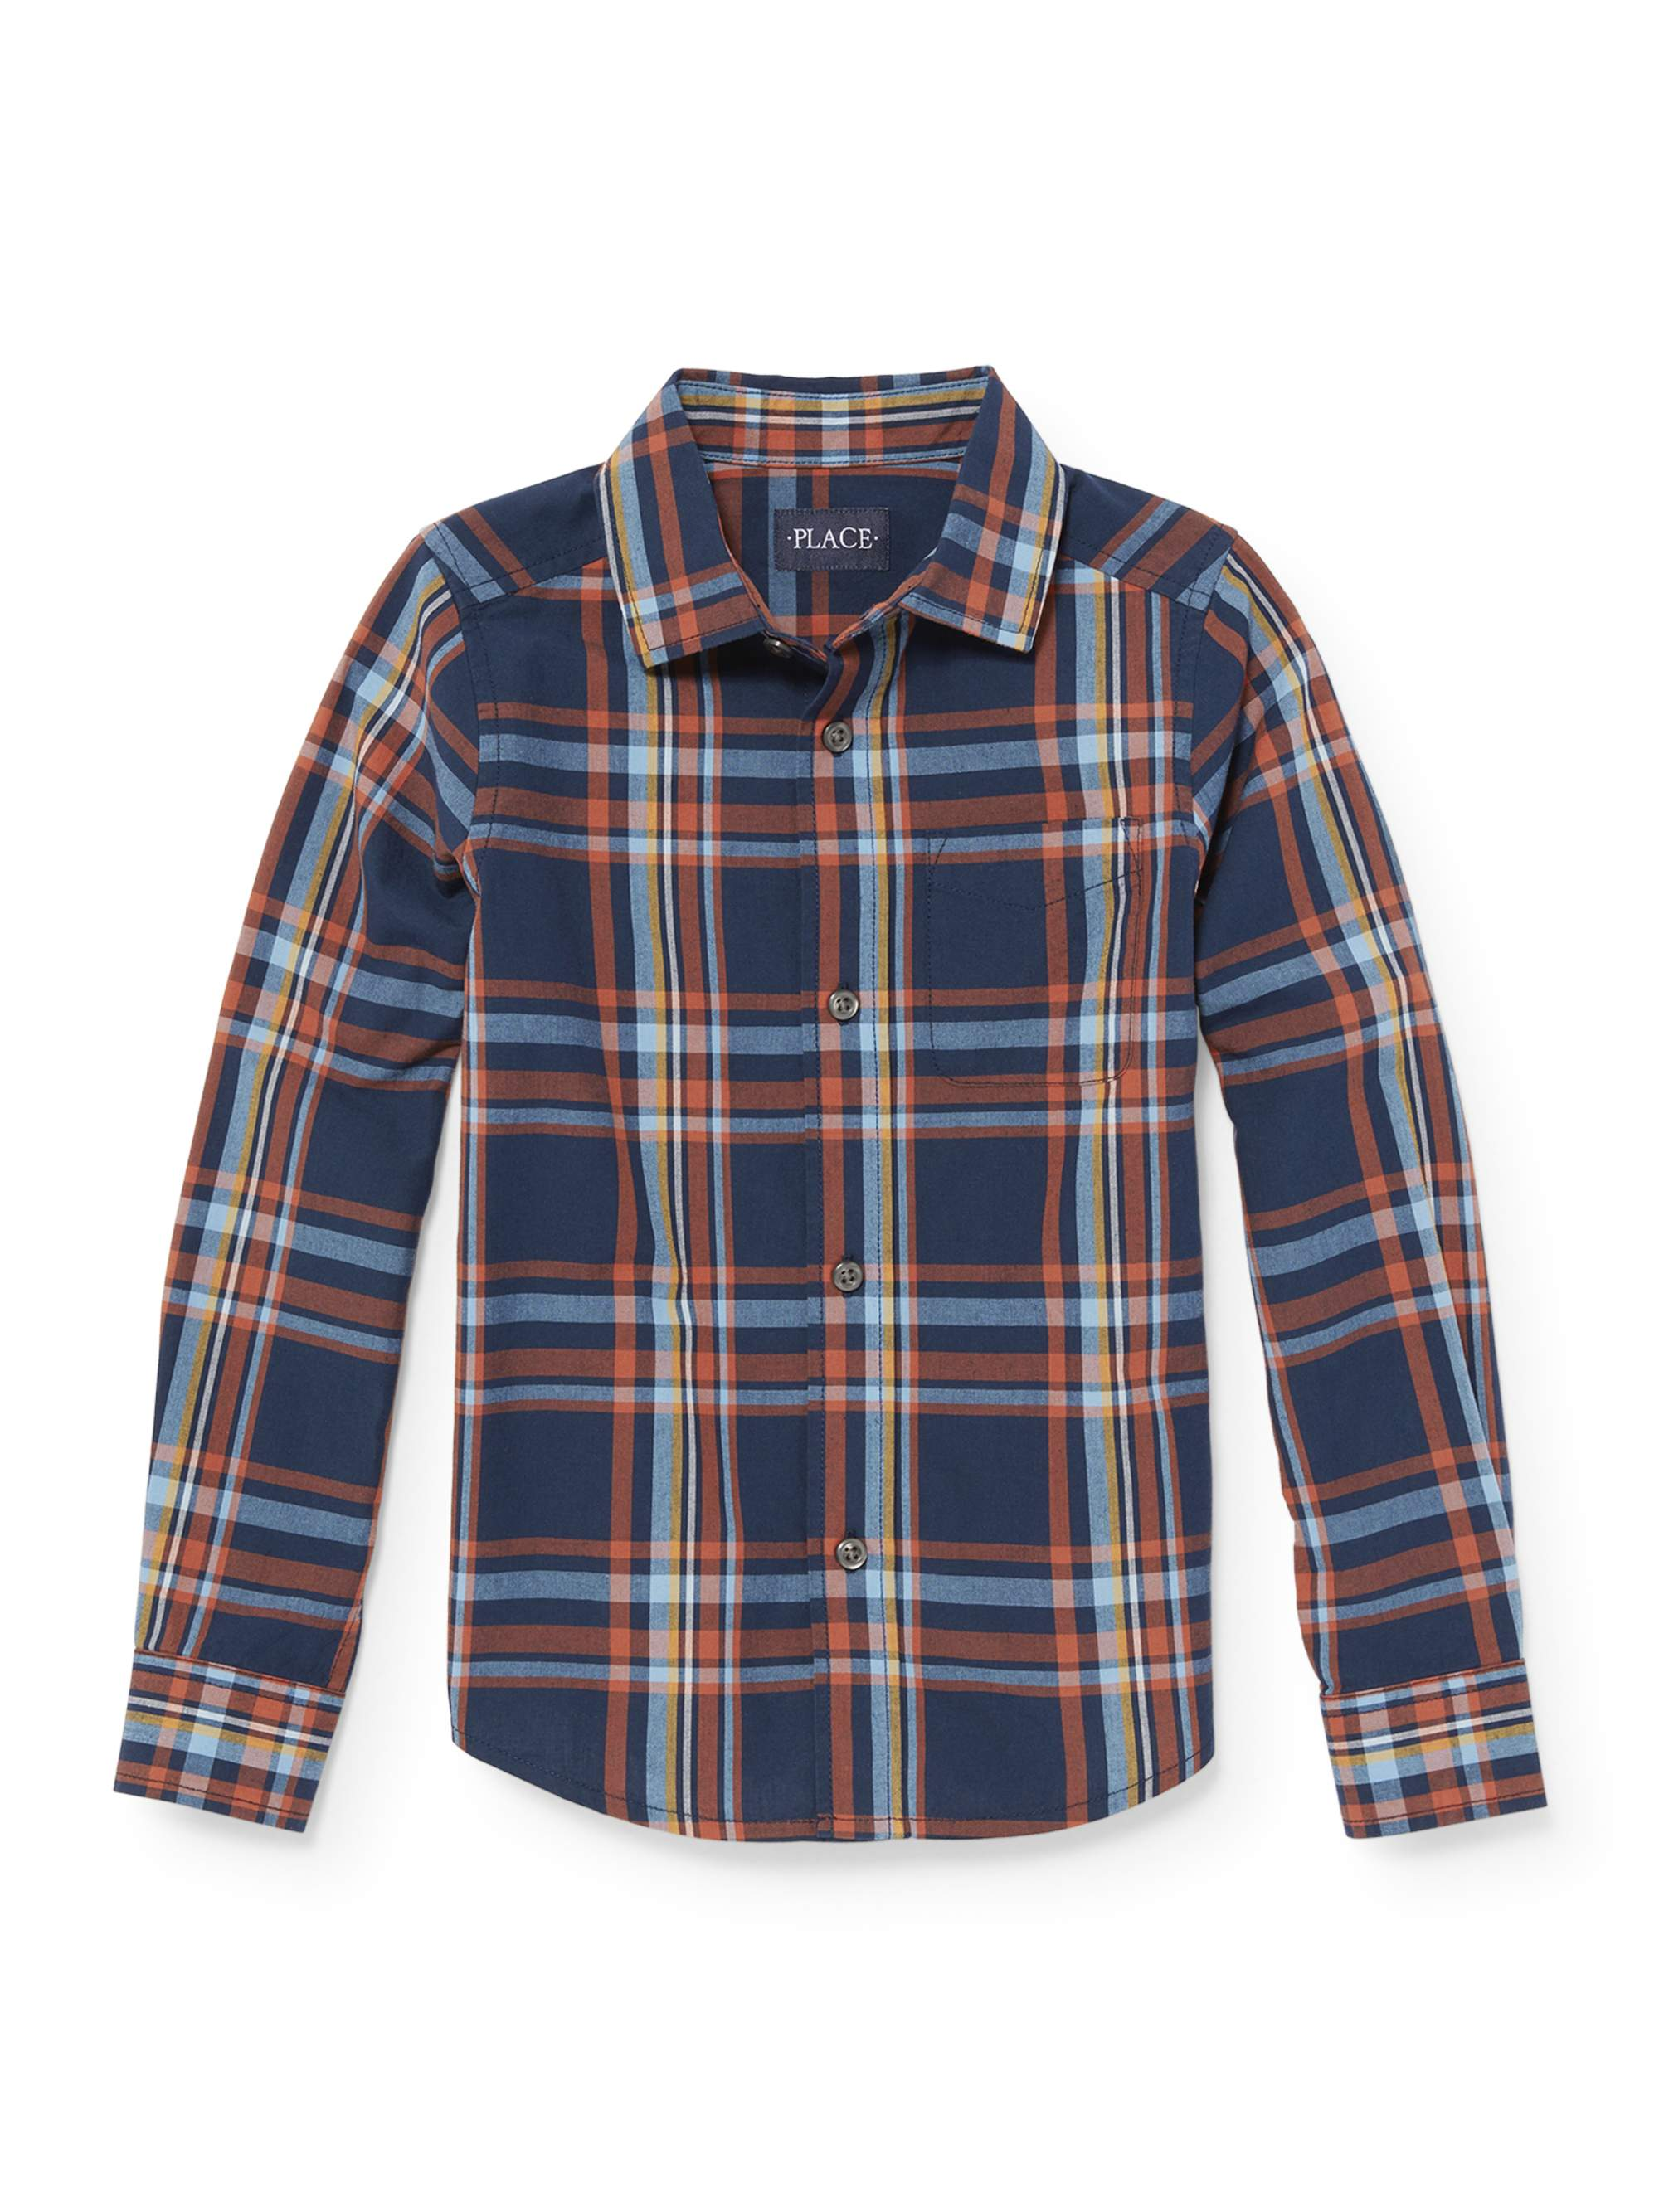 Long Sleeve Button Up Navy Twill Plaid Shirt (Little Boys & Big Boys)